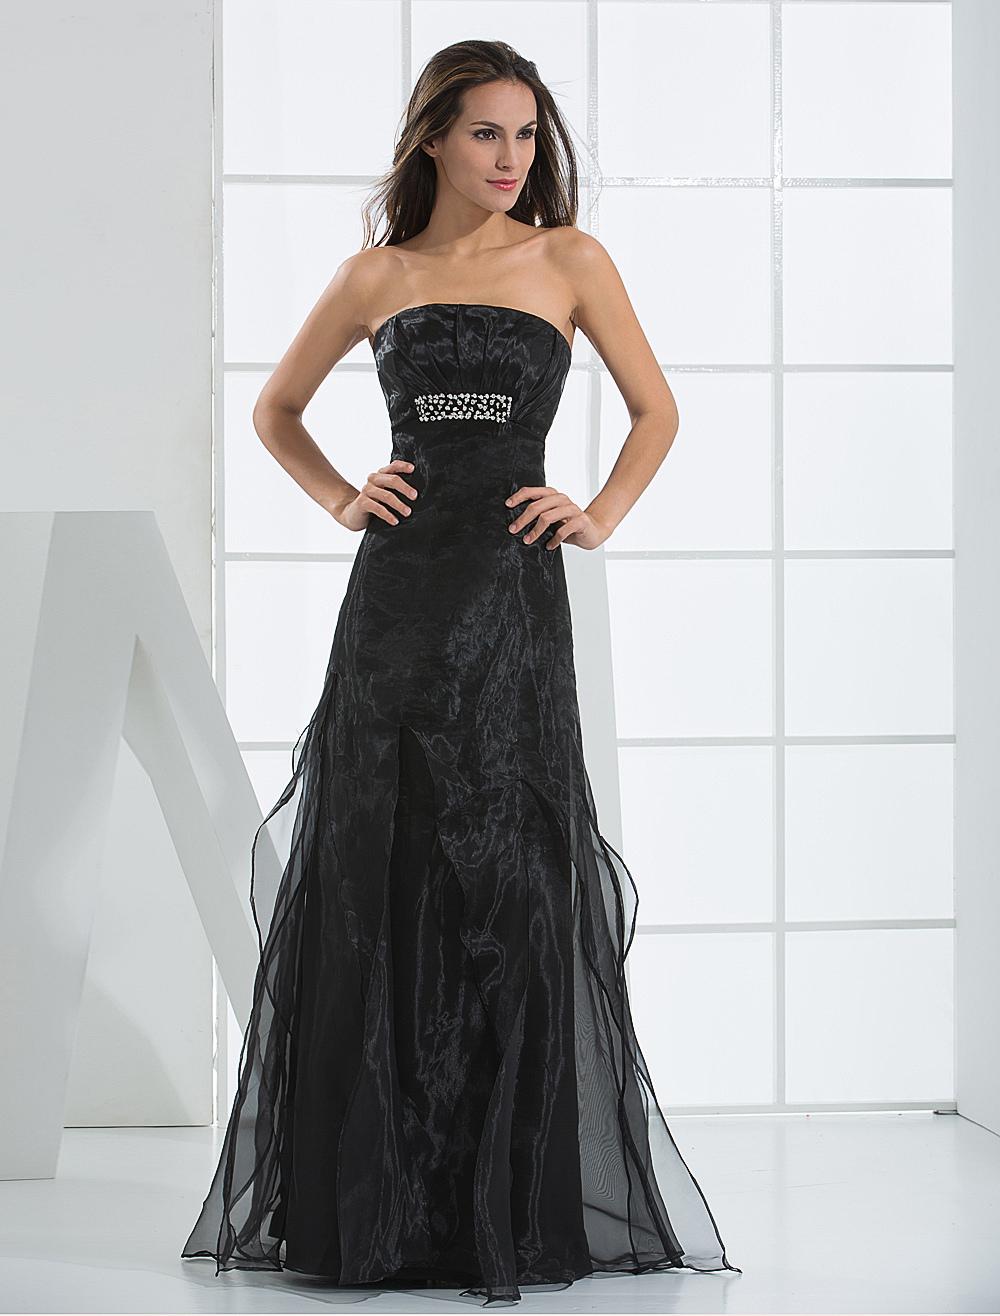 Black Evening Dress Strapless Beaded Lace Up Tulle Satin Dress (Wedding Evening Dresses) photo